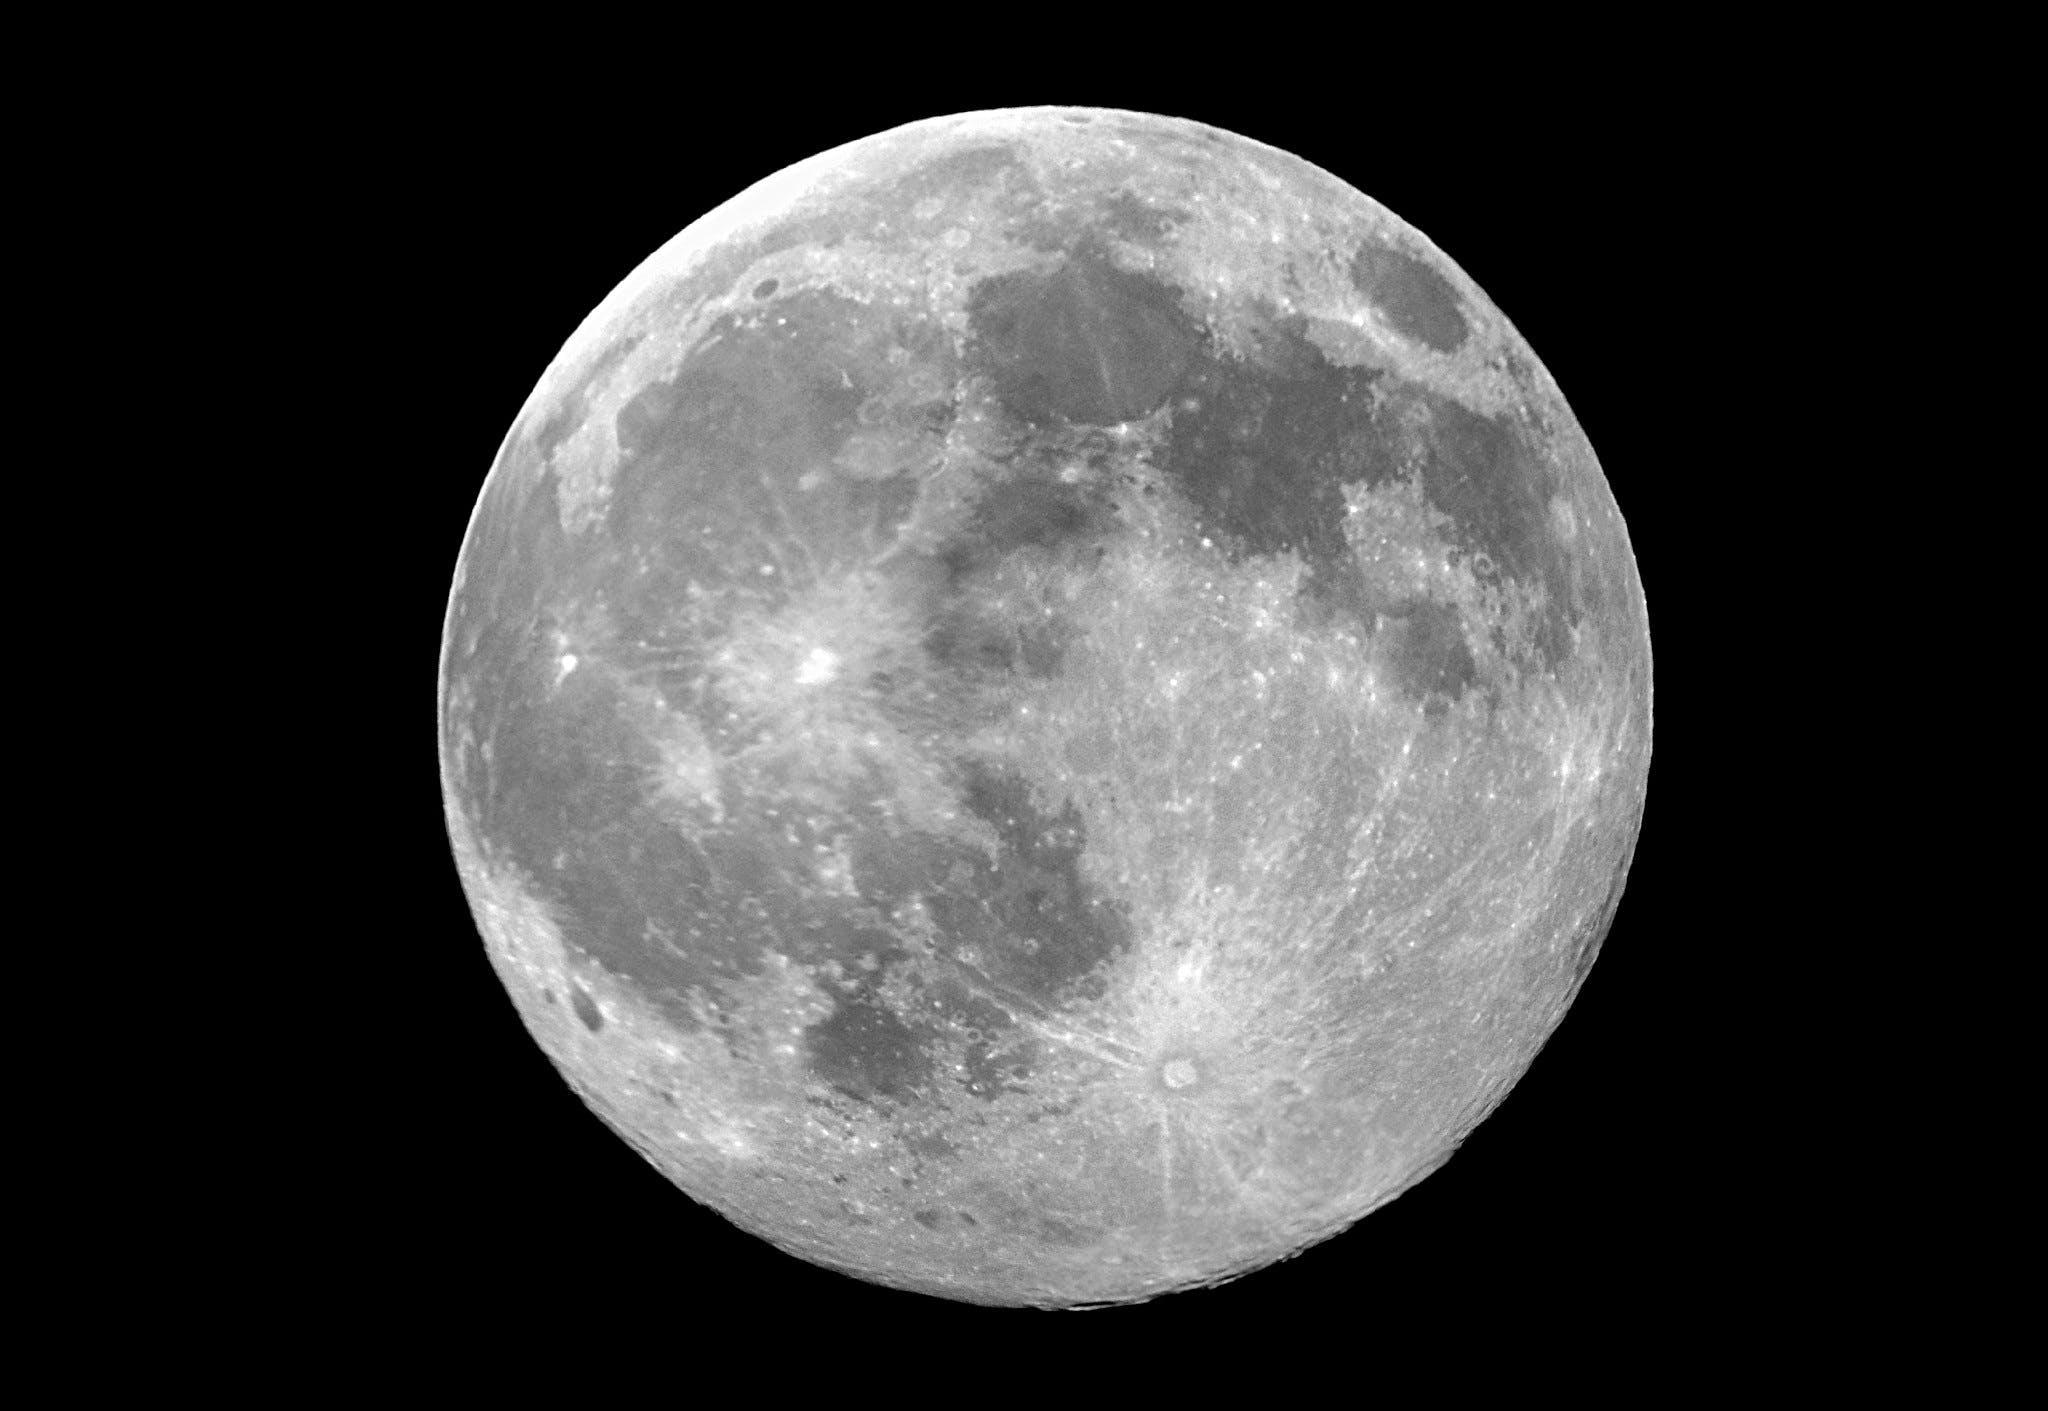 Free stock photo of astronomy, black, bright, celestial